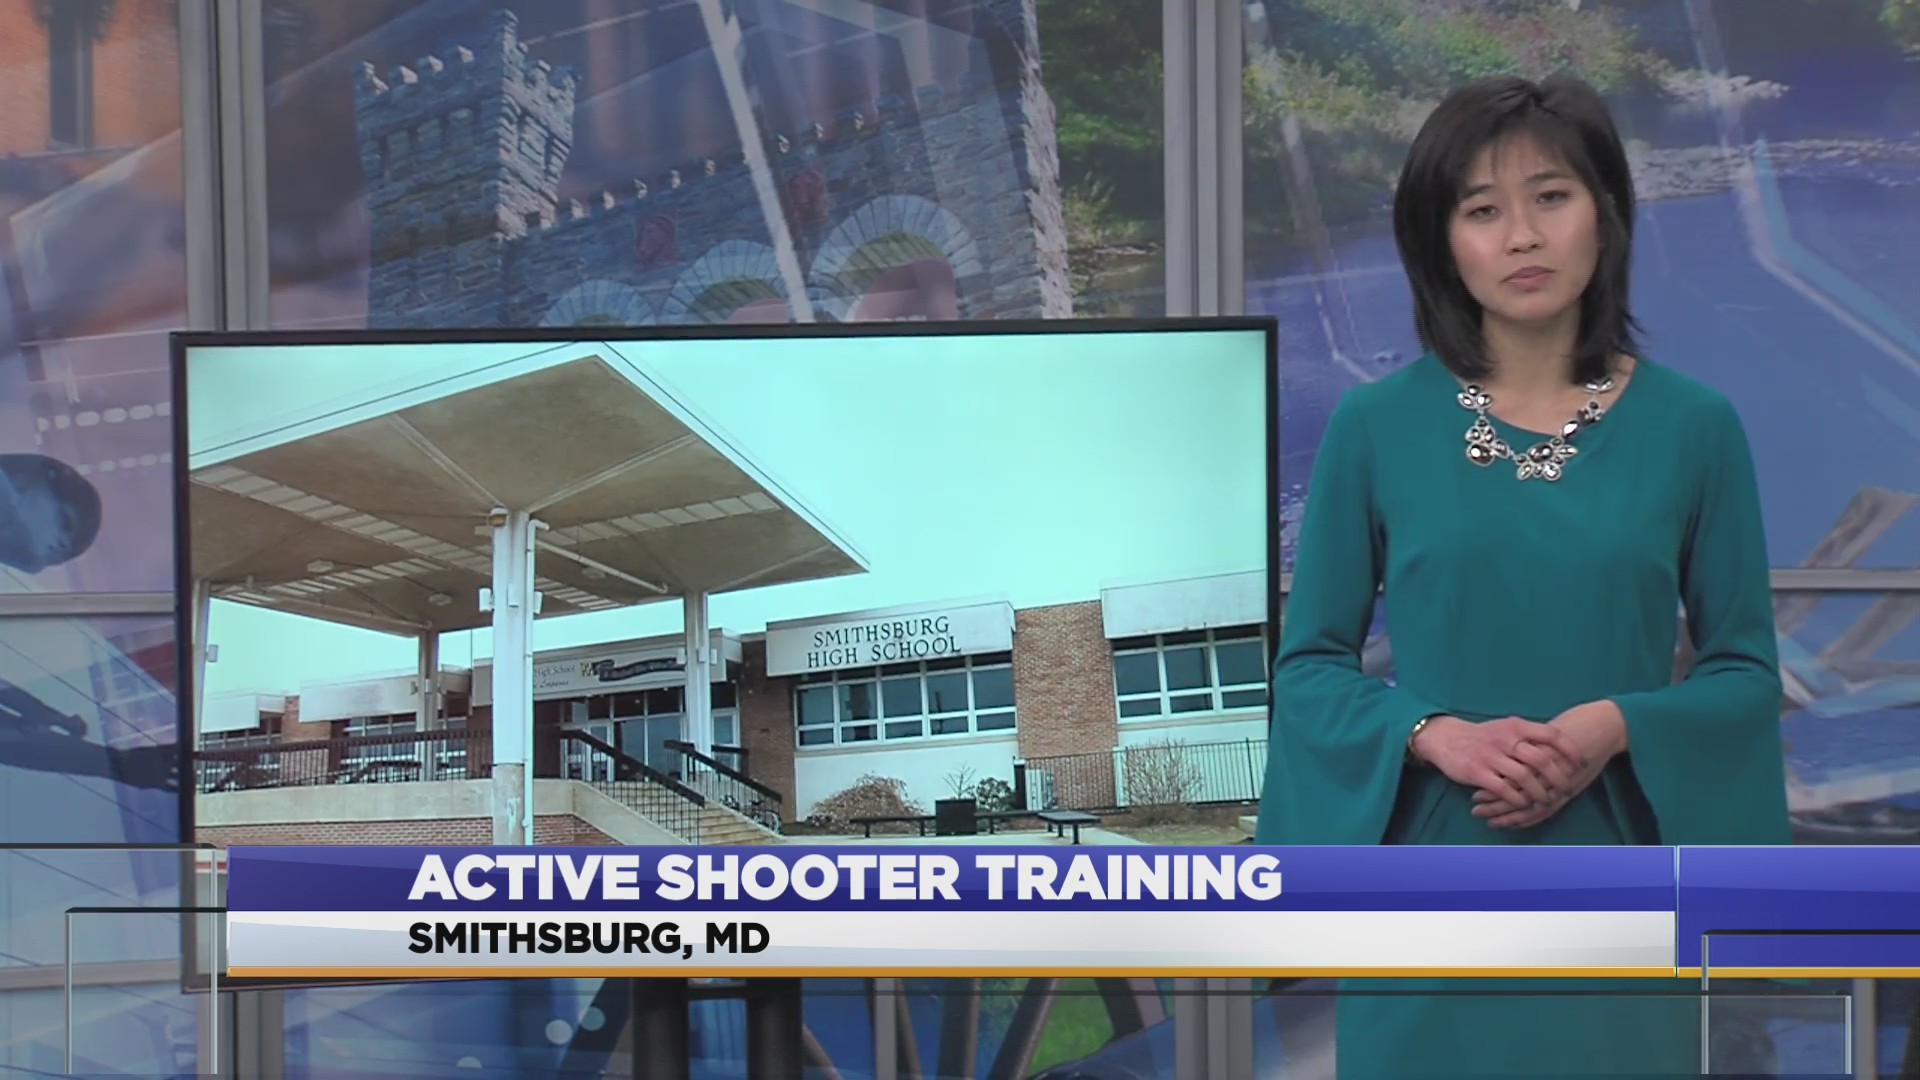 SMITHSBURG_EMS_ACTIVE_SHOOTER_TRAINING_0_20180317232858